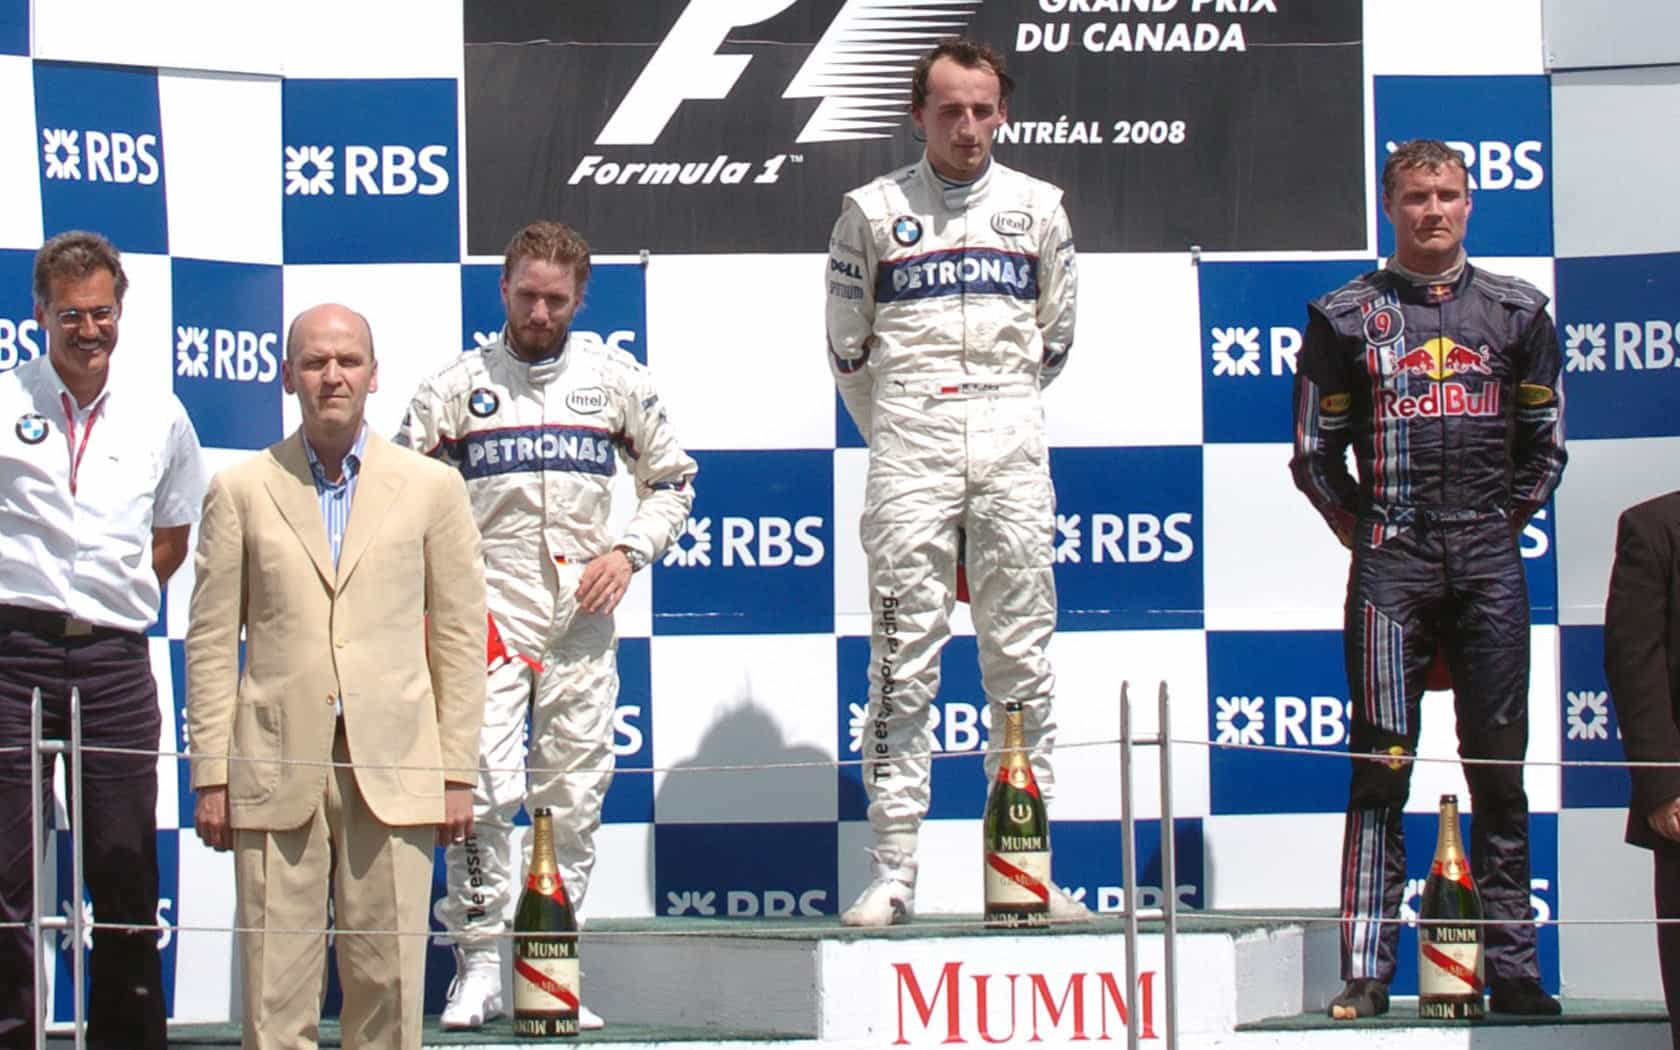 Canada F1 2008 podium Kubica Heidfeld COulthard Foto F1fansite